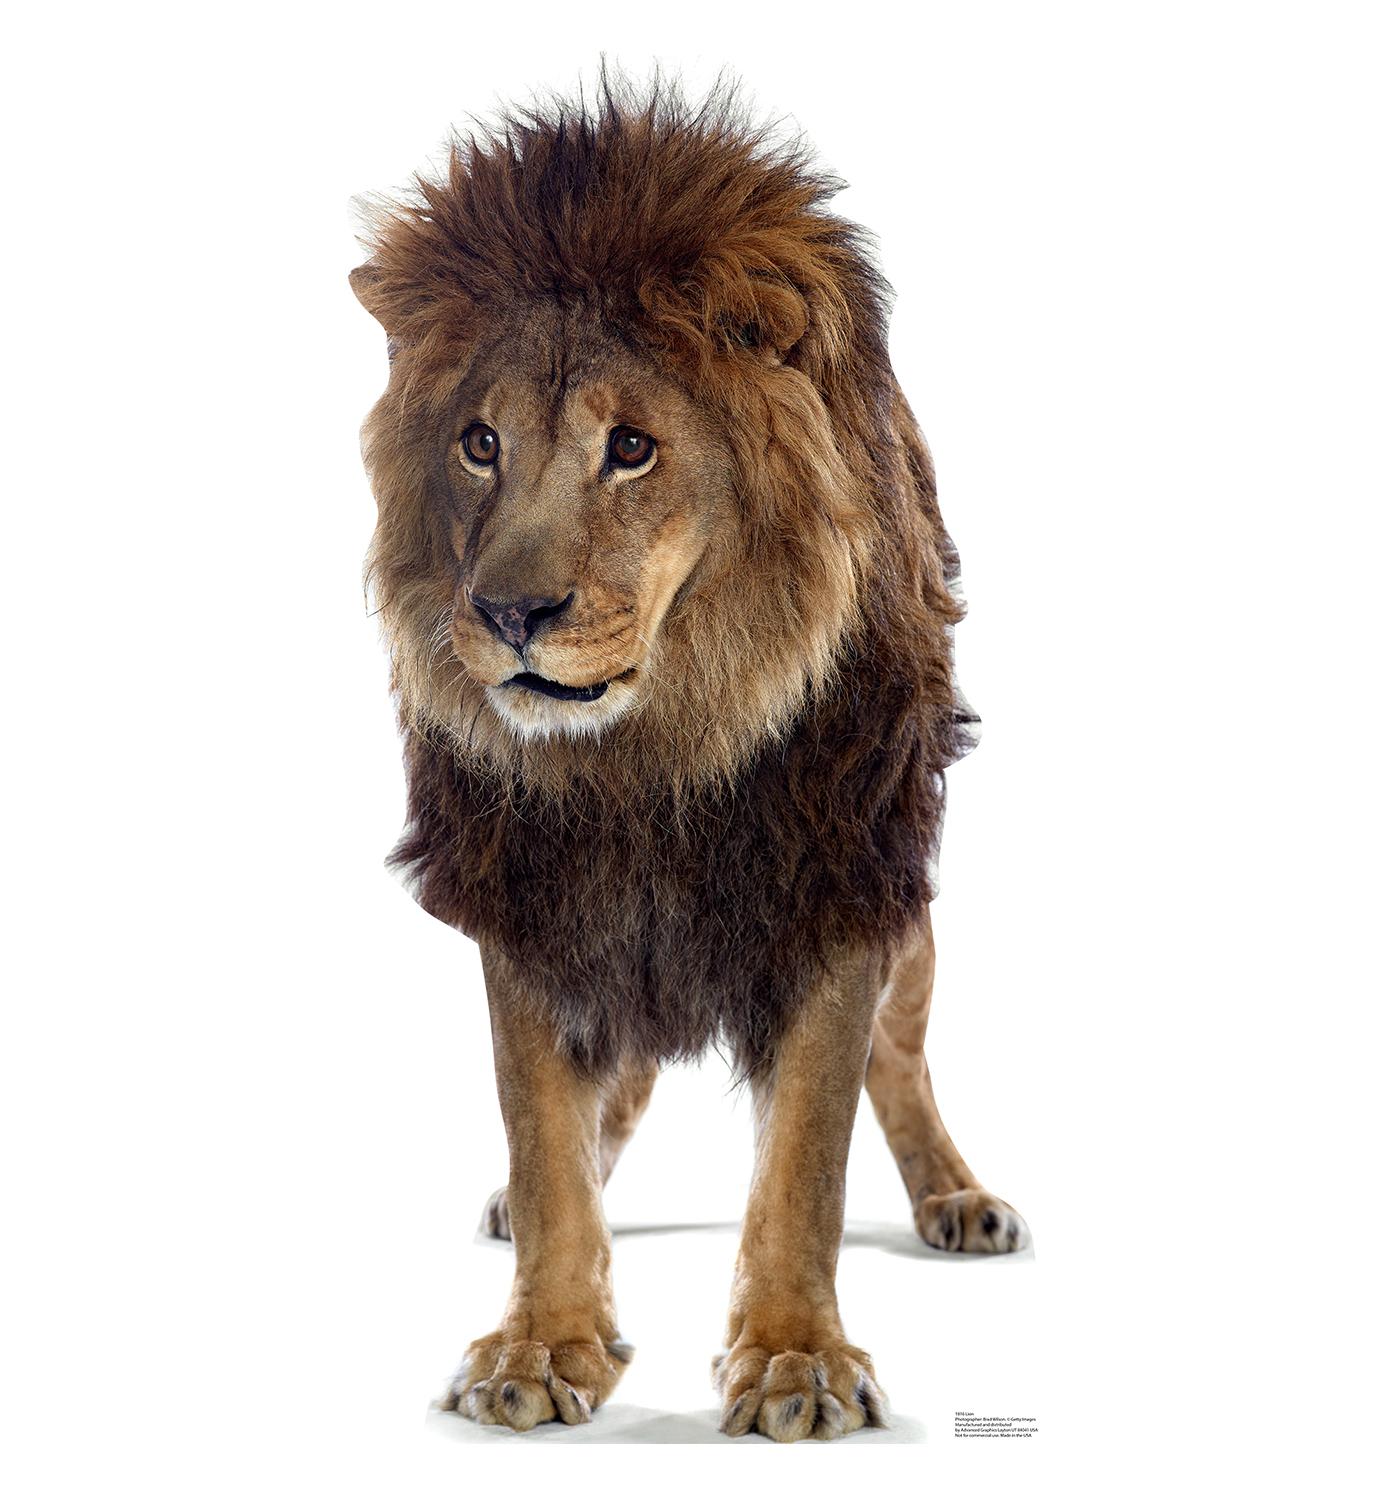 Lion King Cardboard Cutout